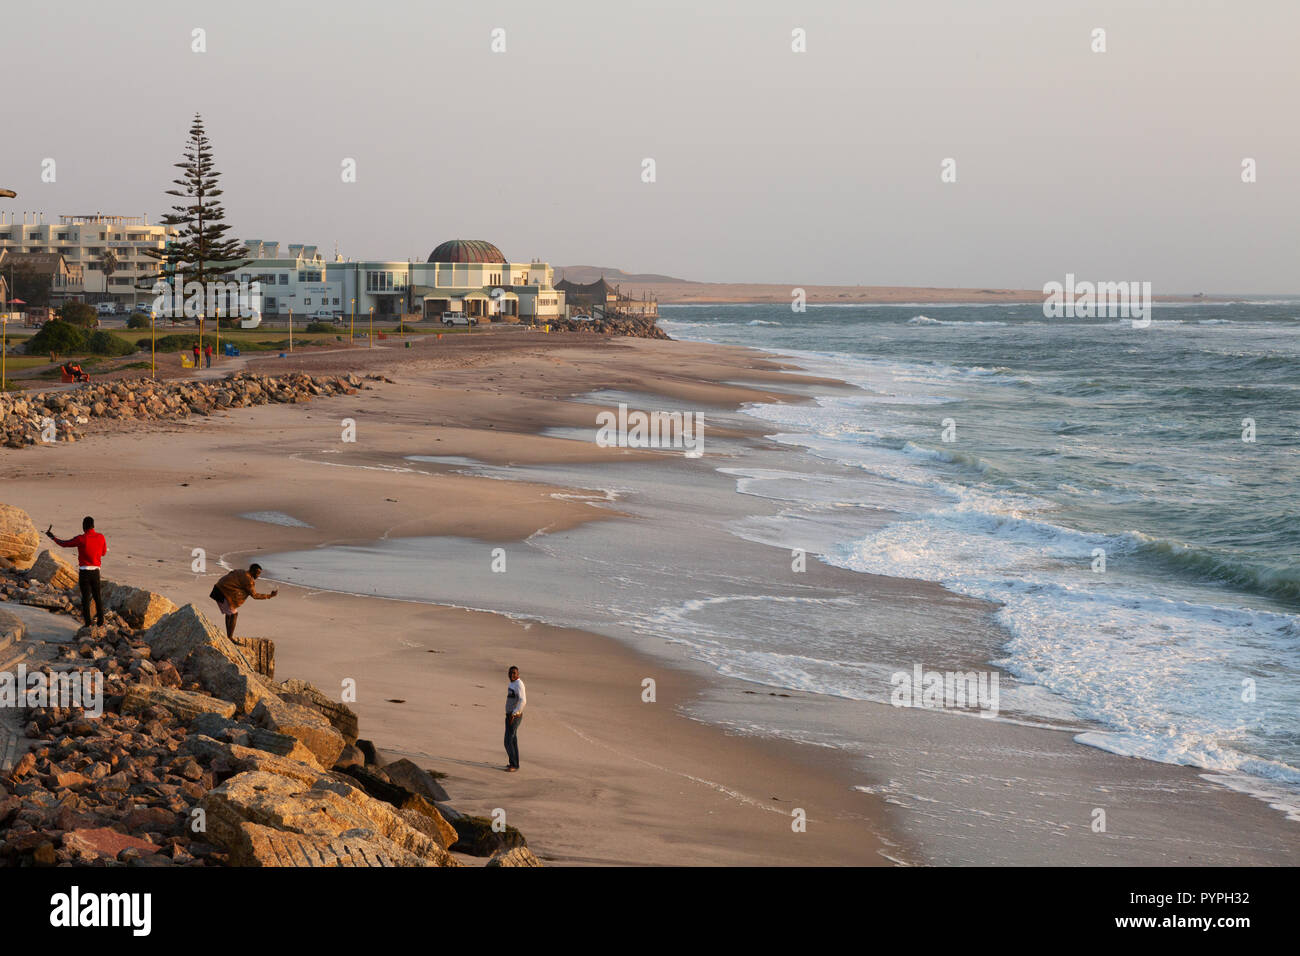 Swakopmund Namibia - Africa seascape; the beach on the Namibian coast at Swakopmund, Namibia, Africa - Stock Image